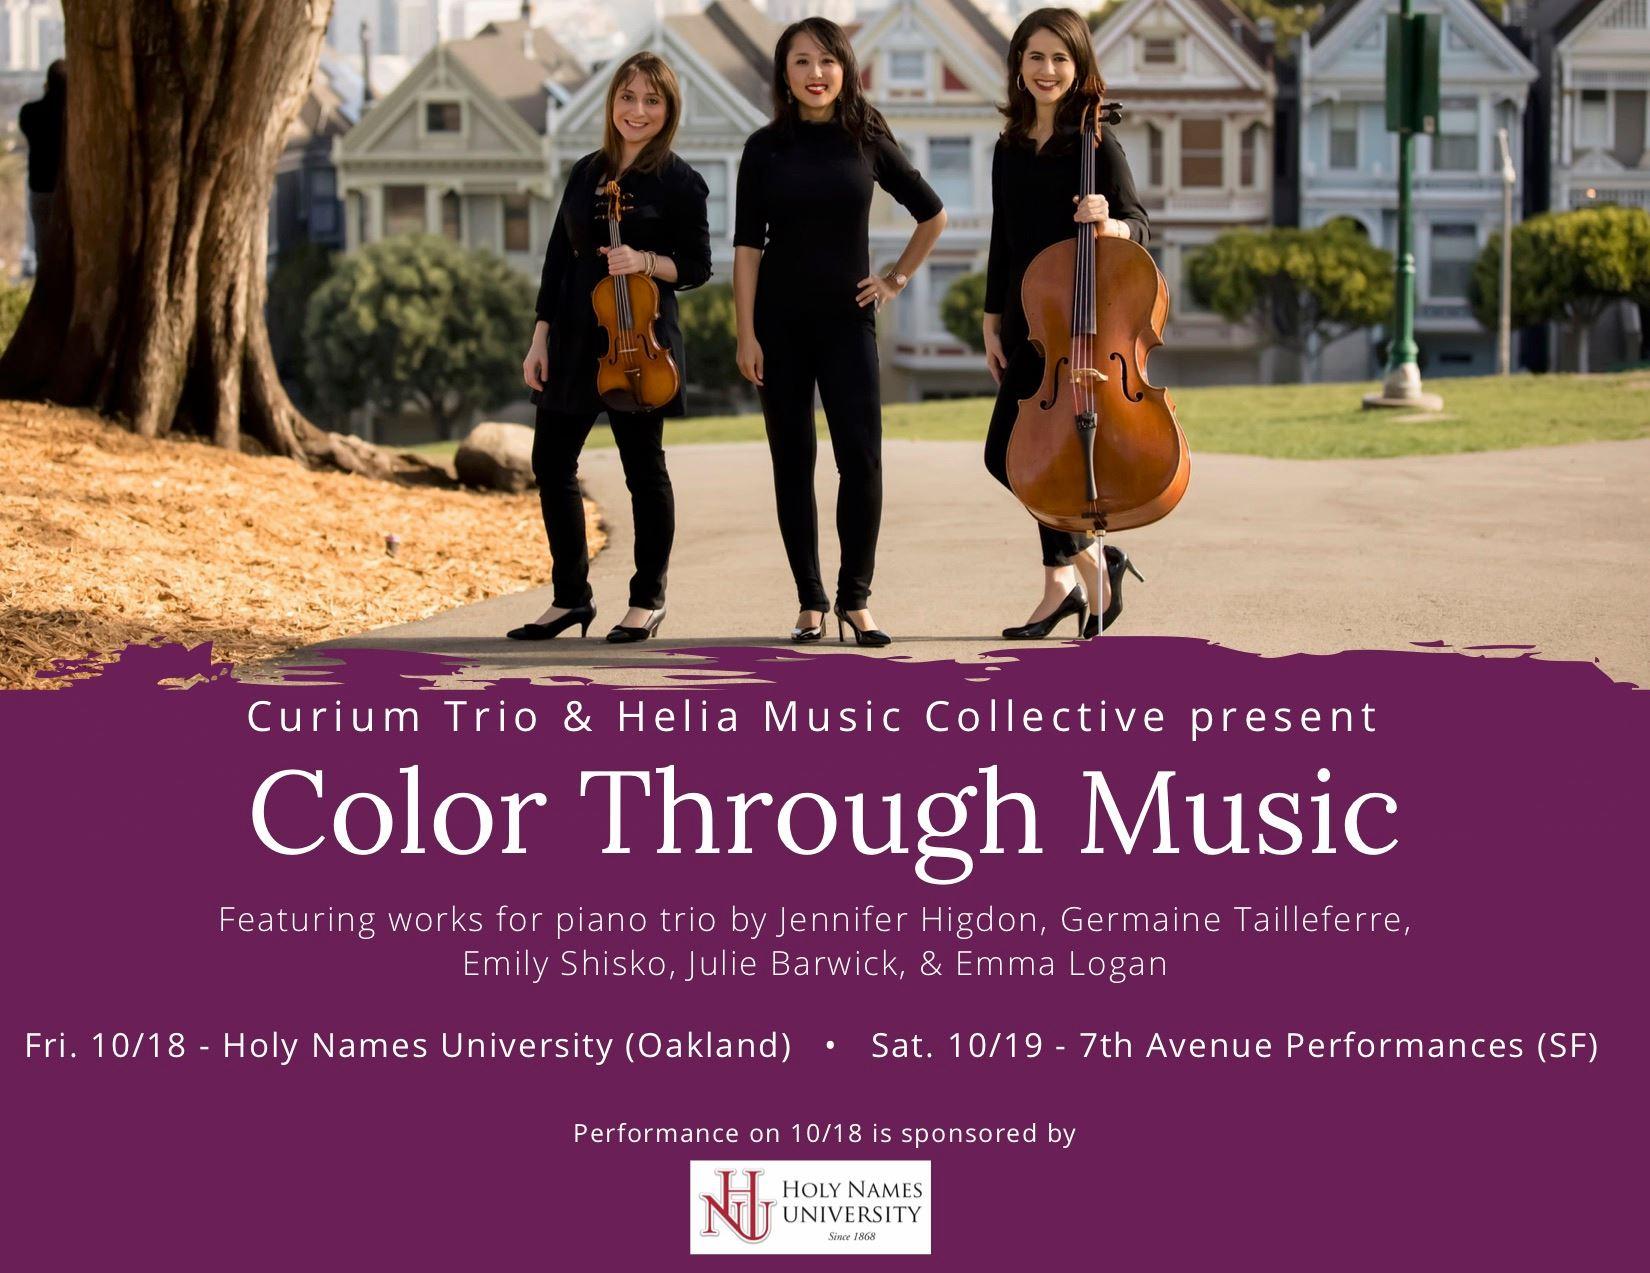 Curium Trio: (left to right) Agnieszka Peszko - violin, Rachel Kim - piano, Carlyn Kessler - cello